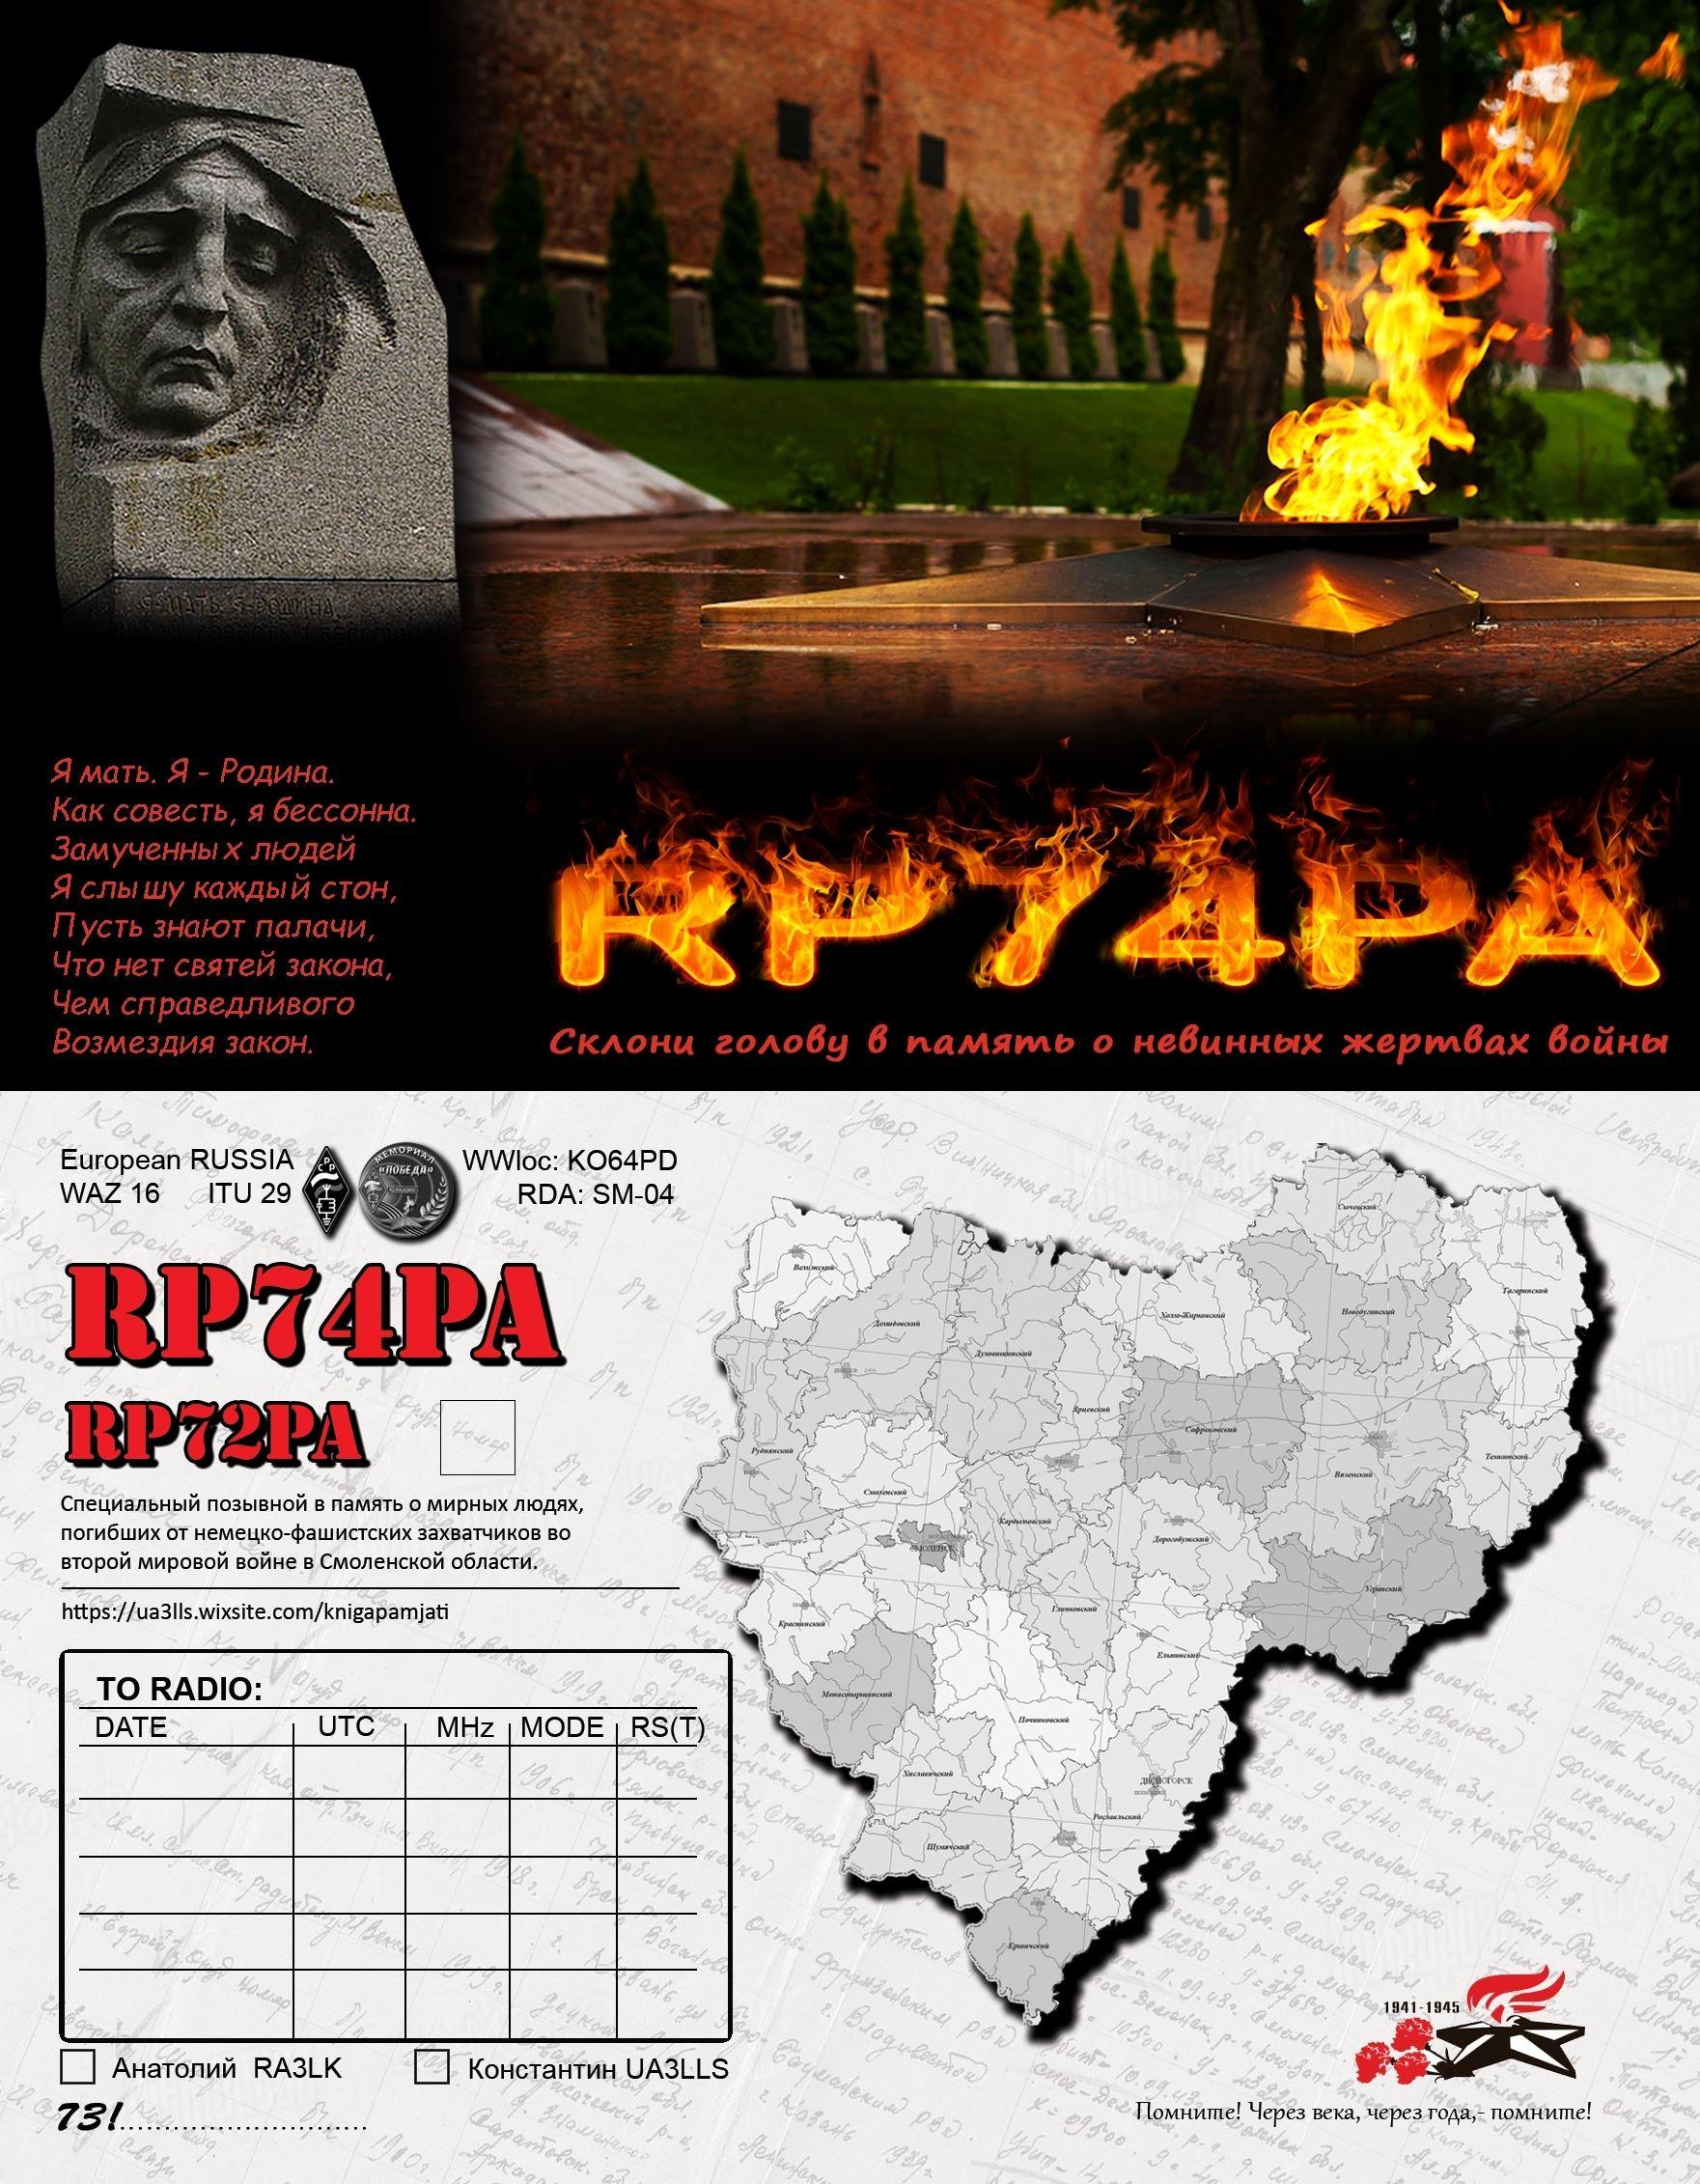 Нажмите на изображение для увеличения.  Название:rp74pa_1.jpg Просмотров:4 Размер:596.9 Кб ID:233623